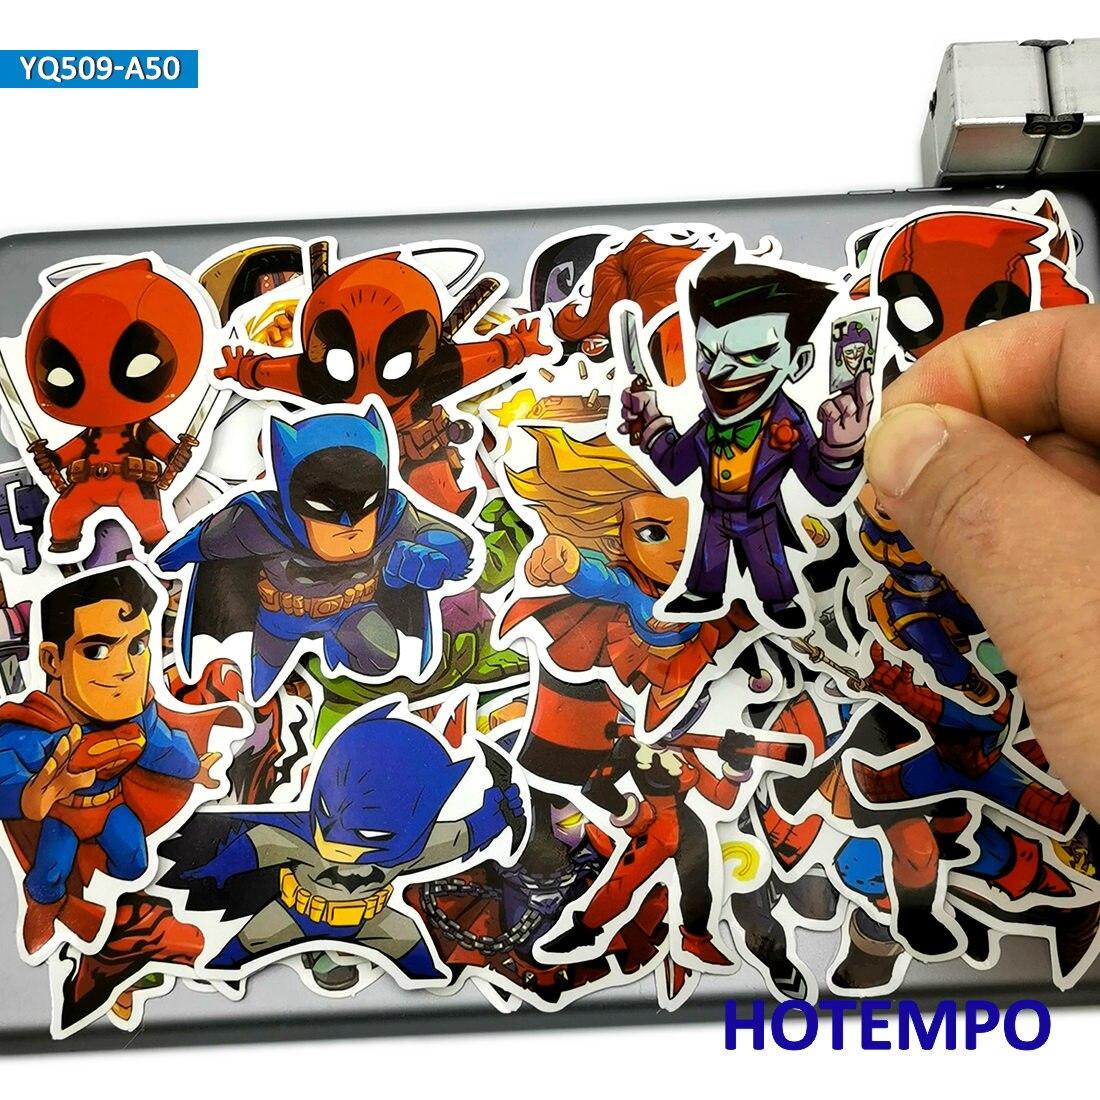 50pcs USA Comics Super Hero Q Style Anime Stickers Toy For Kids Mobile Phone Laptop Suitcase Skateboard Bike Car Cartoon Sticker